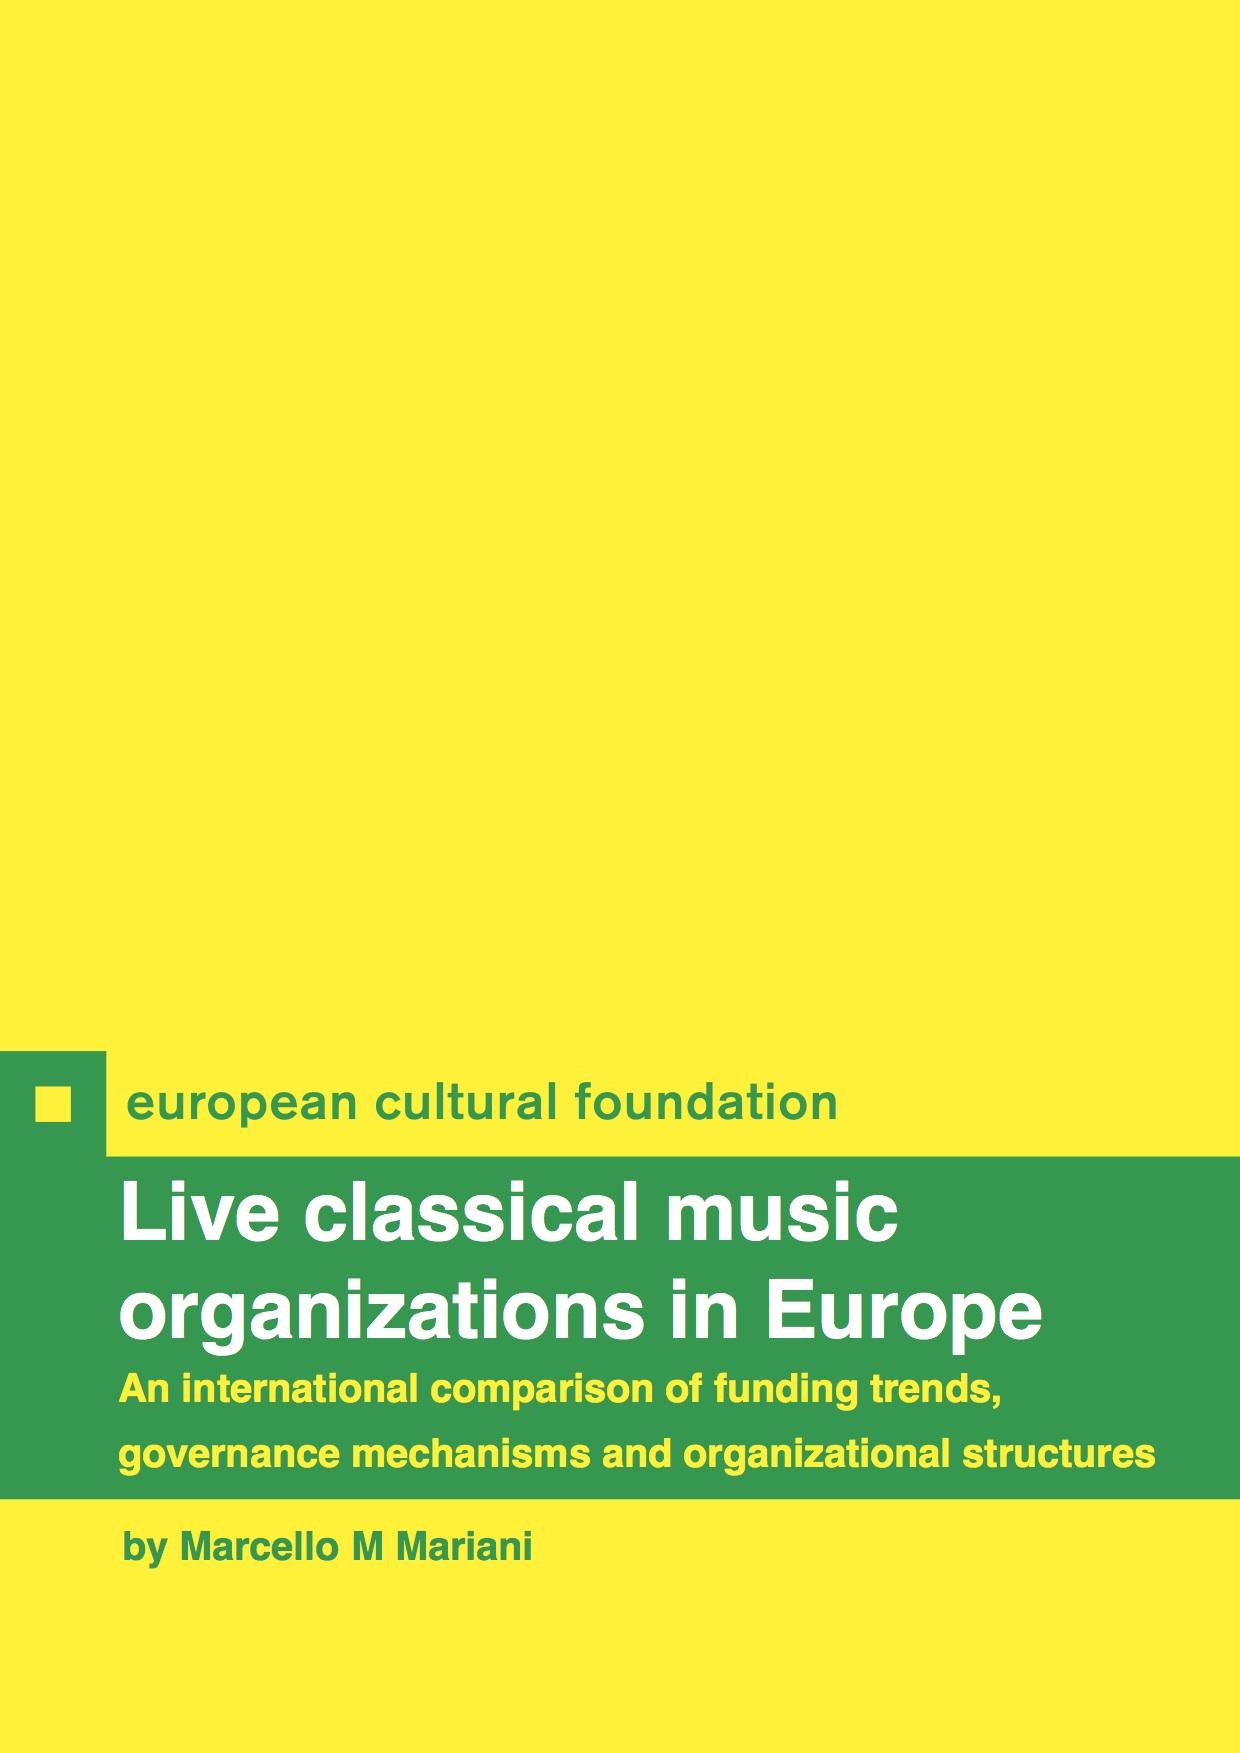 live_classical_music_organizations.jpg